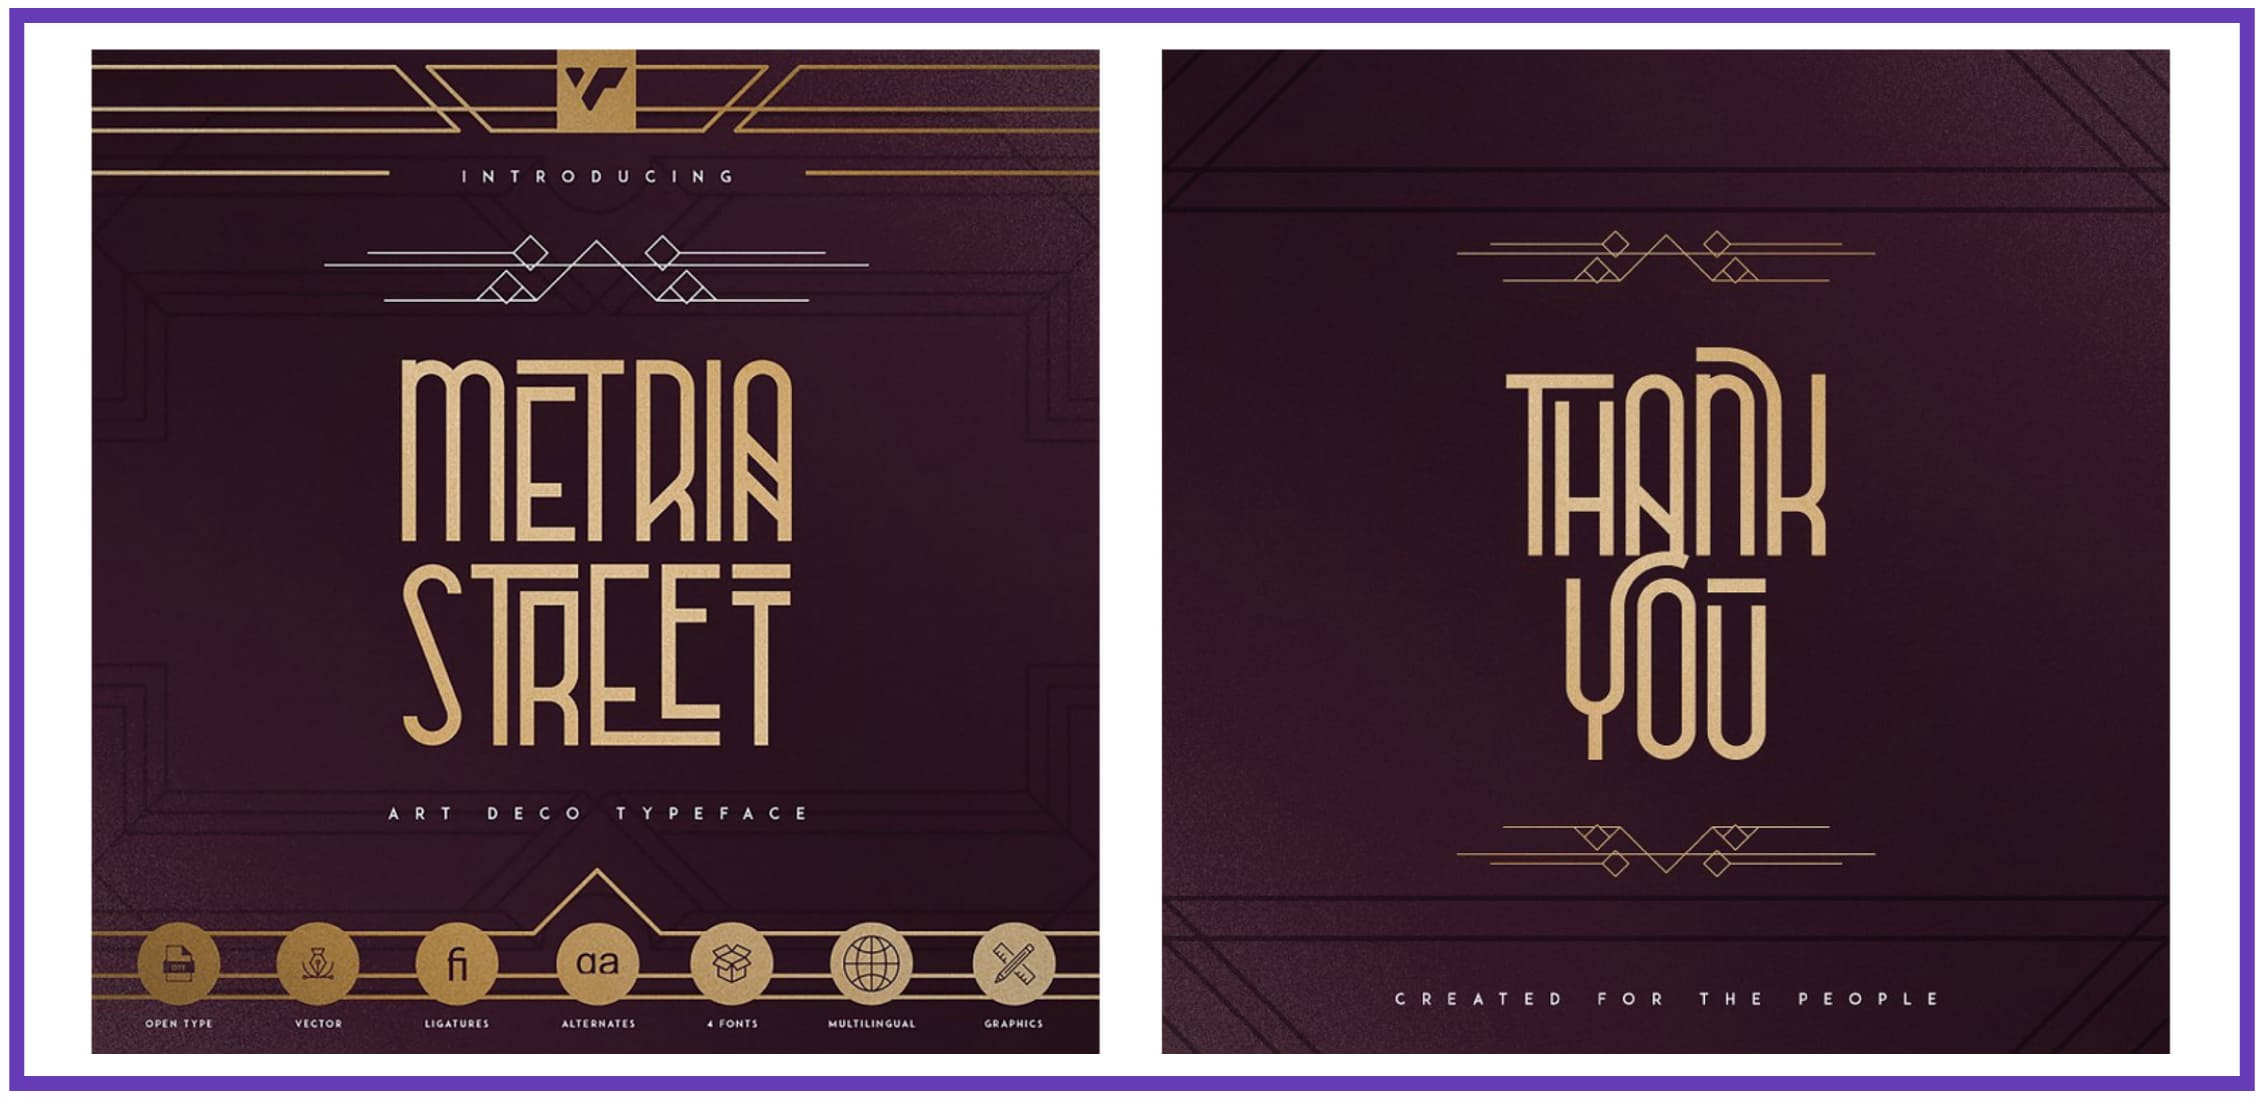 Metria Street – Art Deco Typeface.